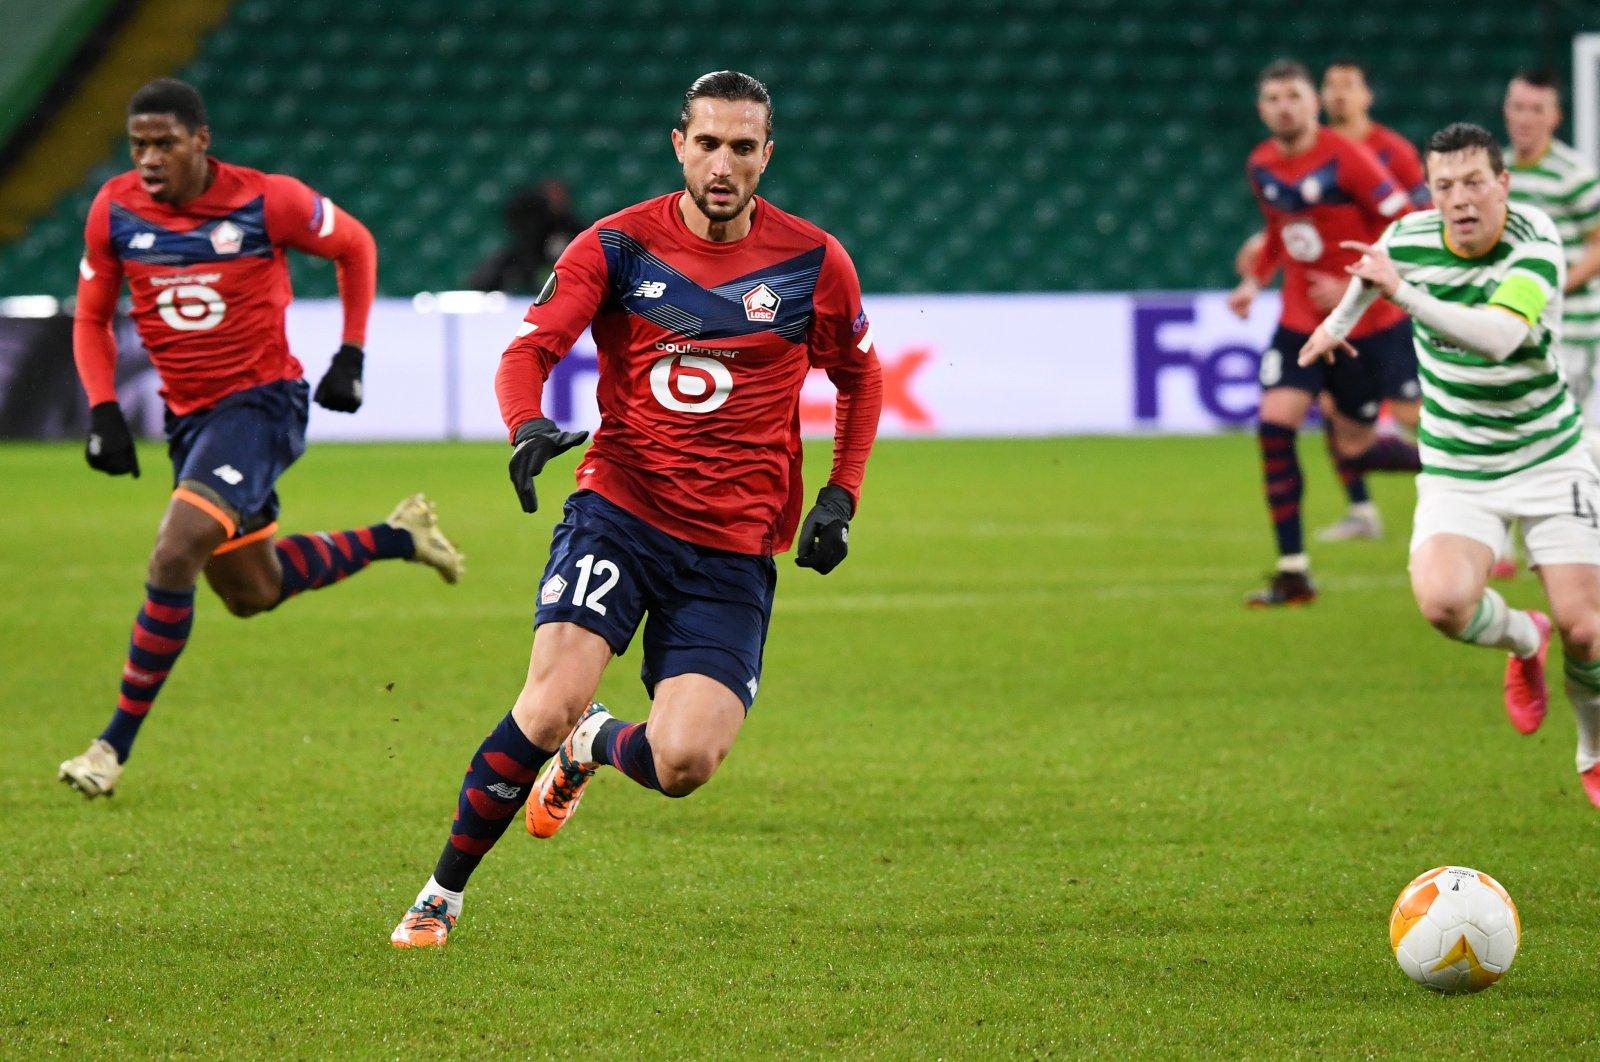 Lille's Yusuf Yazıcı in action during a Europa League match against Celtic Glasgow, in Glasgow, Scotland, Dec. 10, 2020. (EPA Photo)